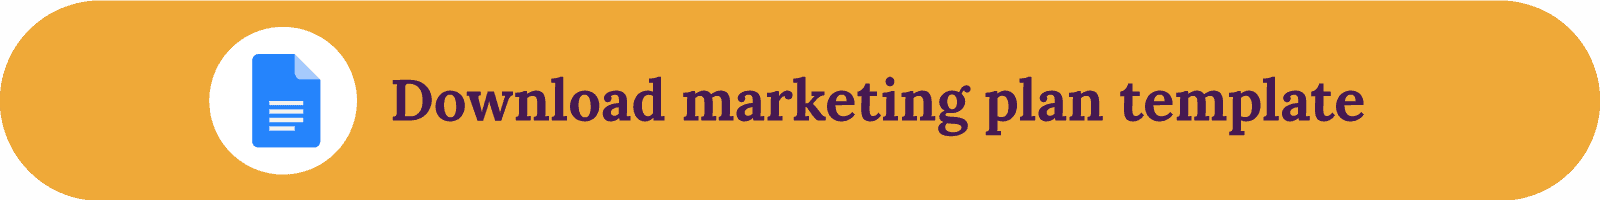 Marketing plan template download button